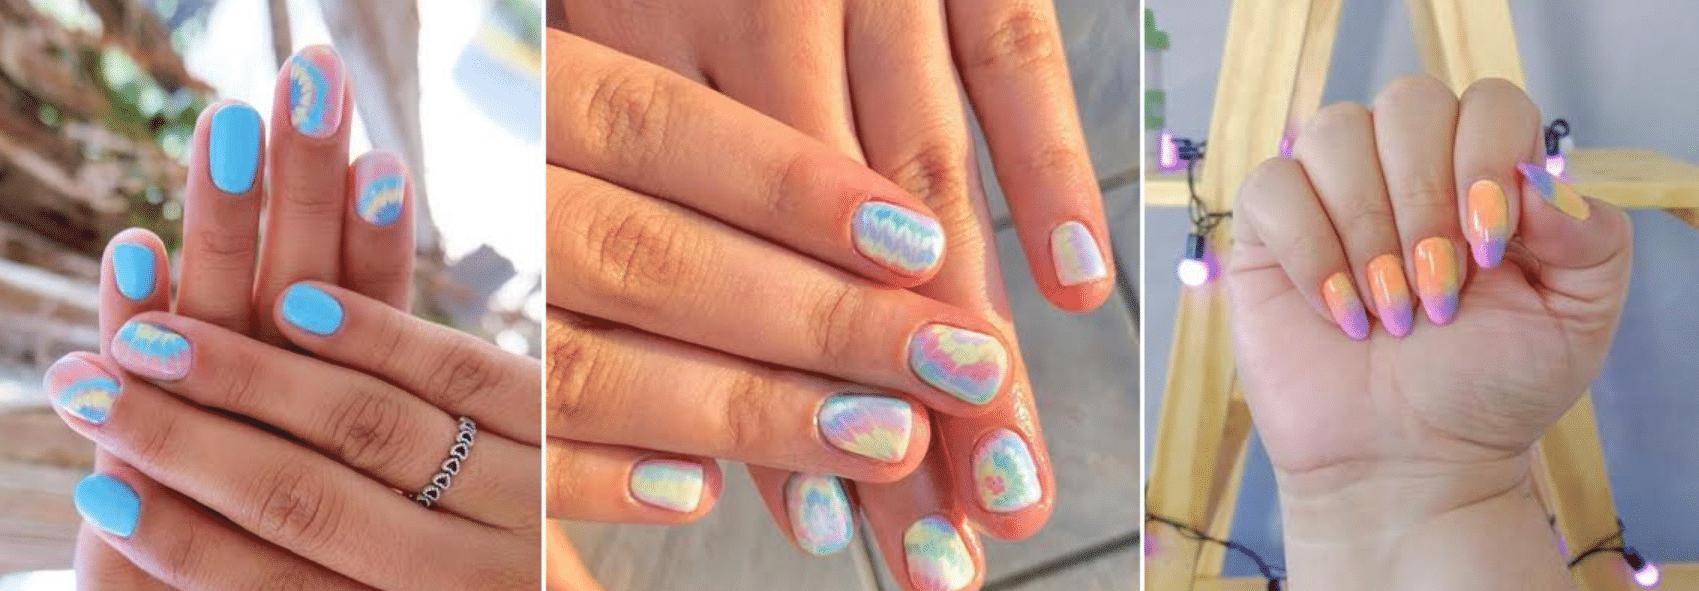 fotos de unhas decoradas com tie dye